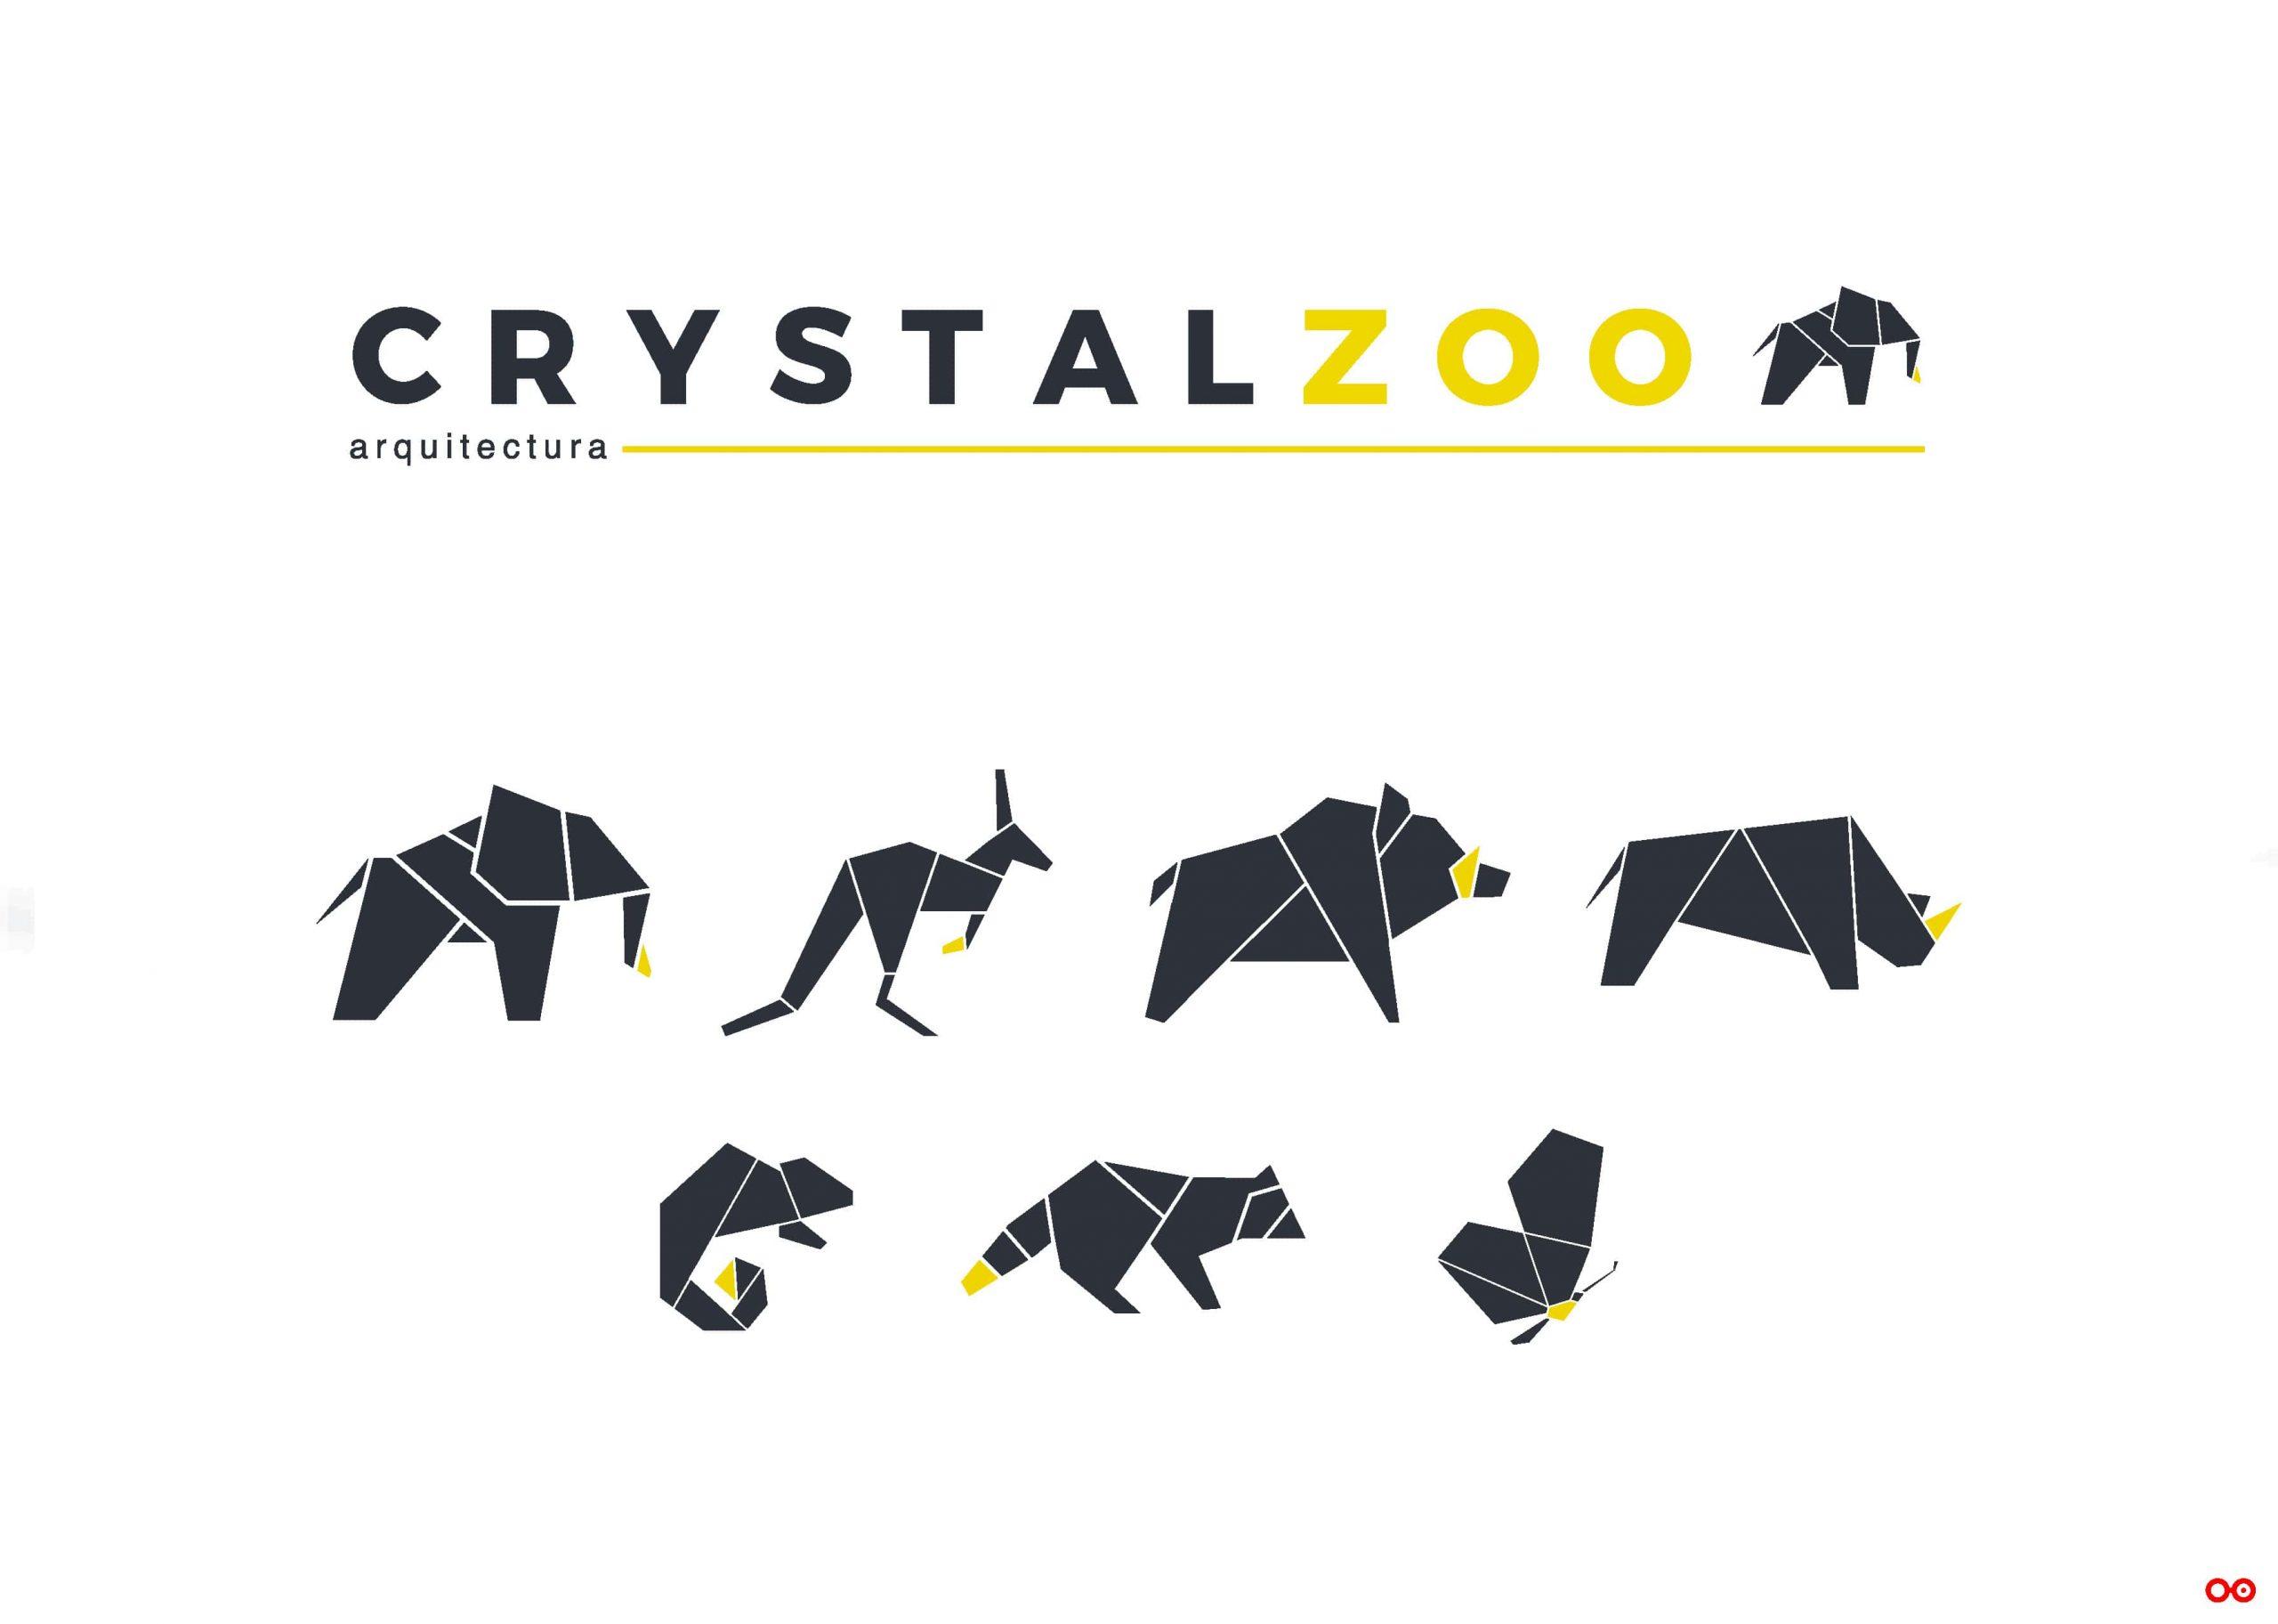 Crystalzoo Simbolo Ingenio Creativo